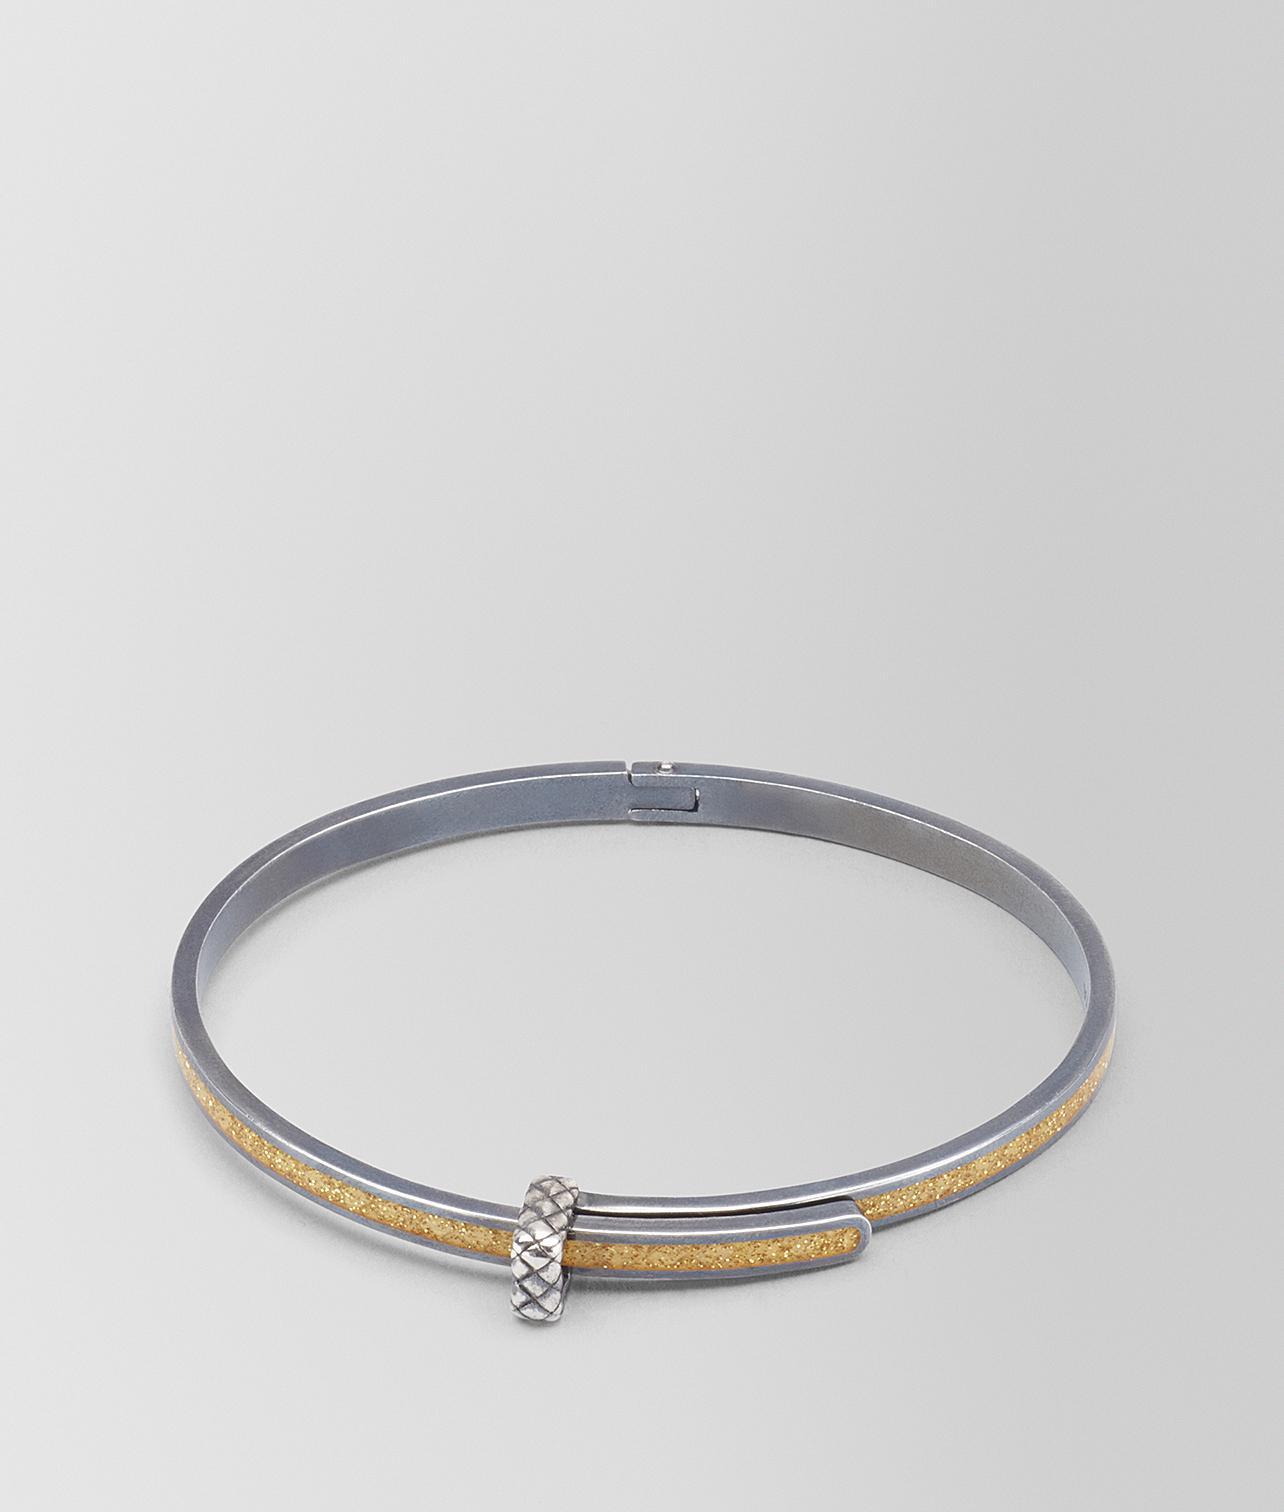 Bottega Veneta gold cubic zirconia oxidized silver bracelet - Metallic aFZjwLKsrE